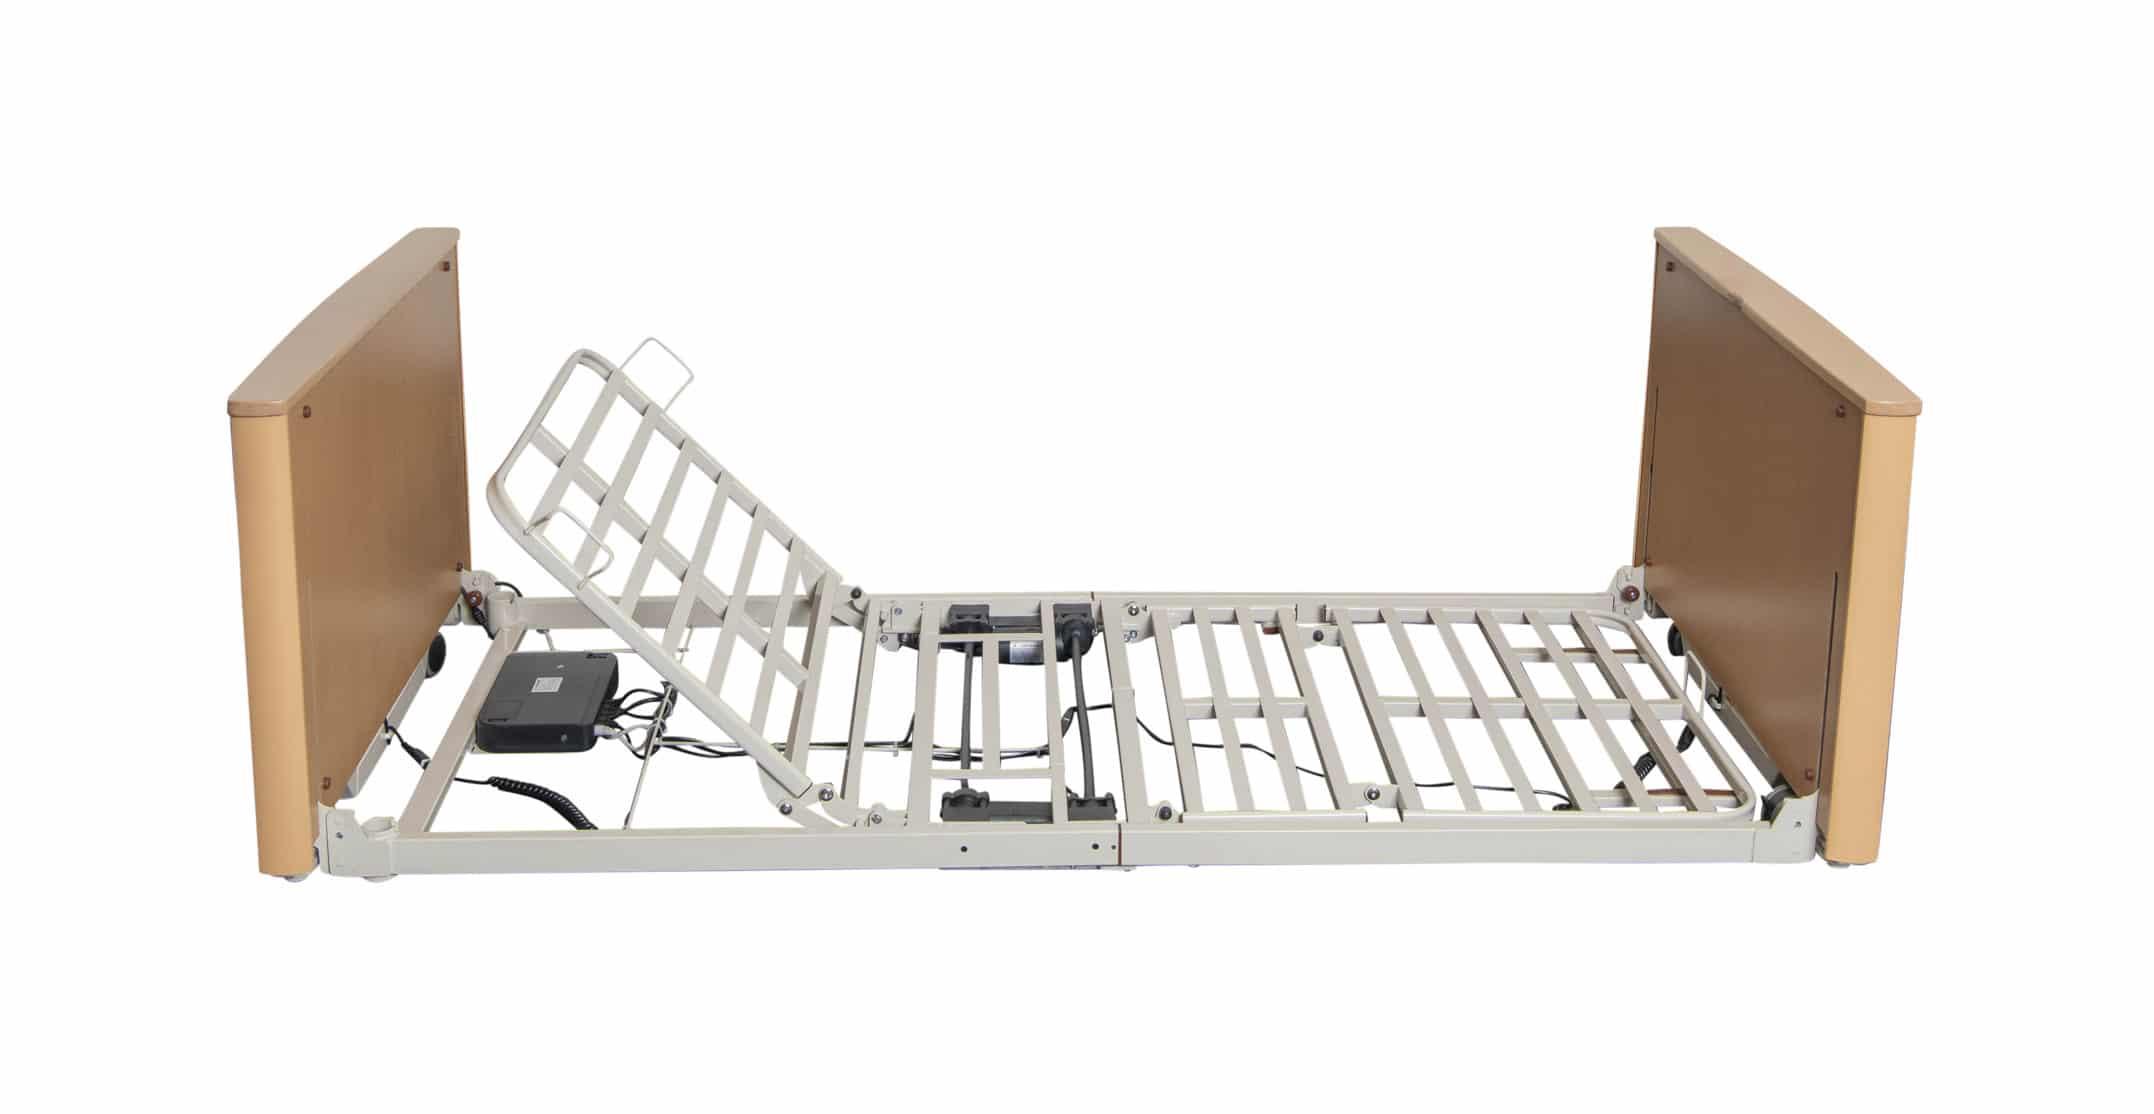 Floorline 7 5 King Single Bed Reducing Injury From Falls